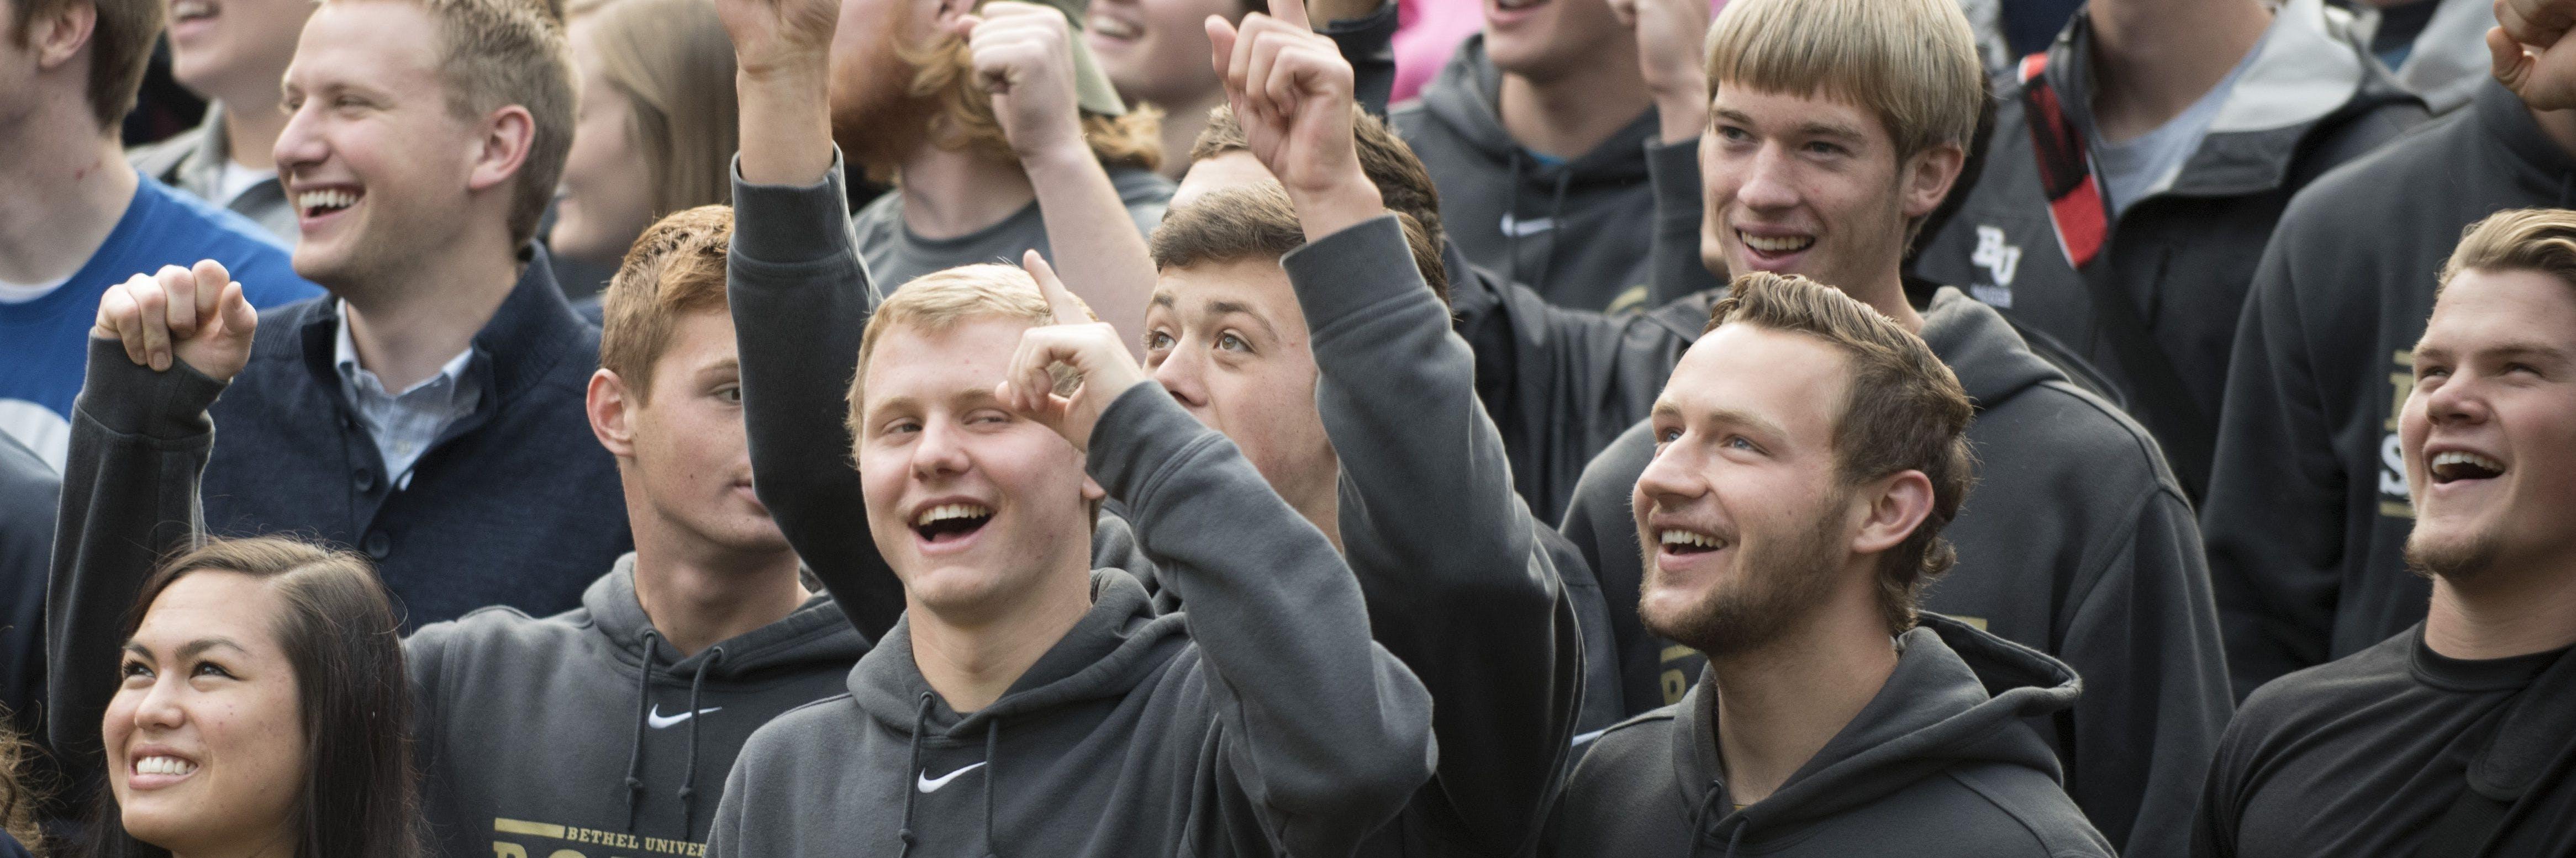 Student athletes celebrate the Wellness Center groundbreaking.